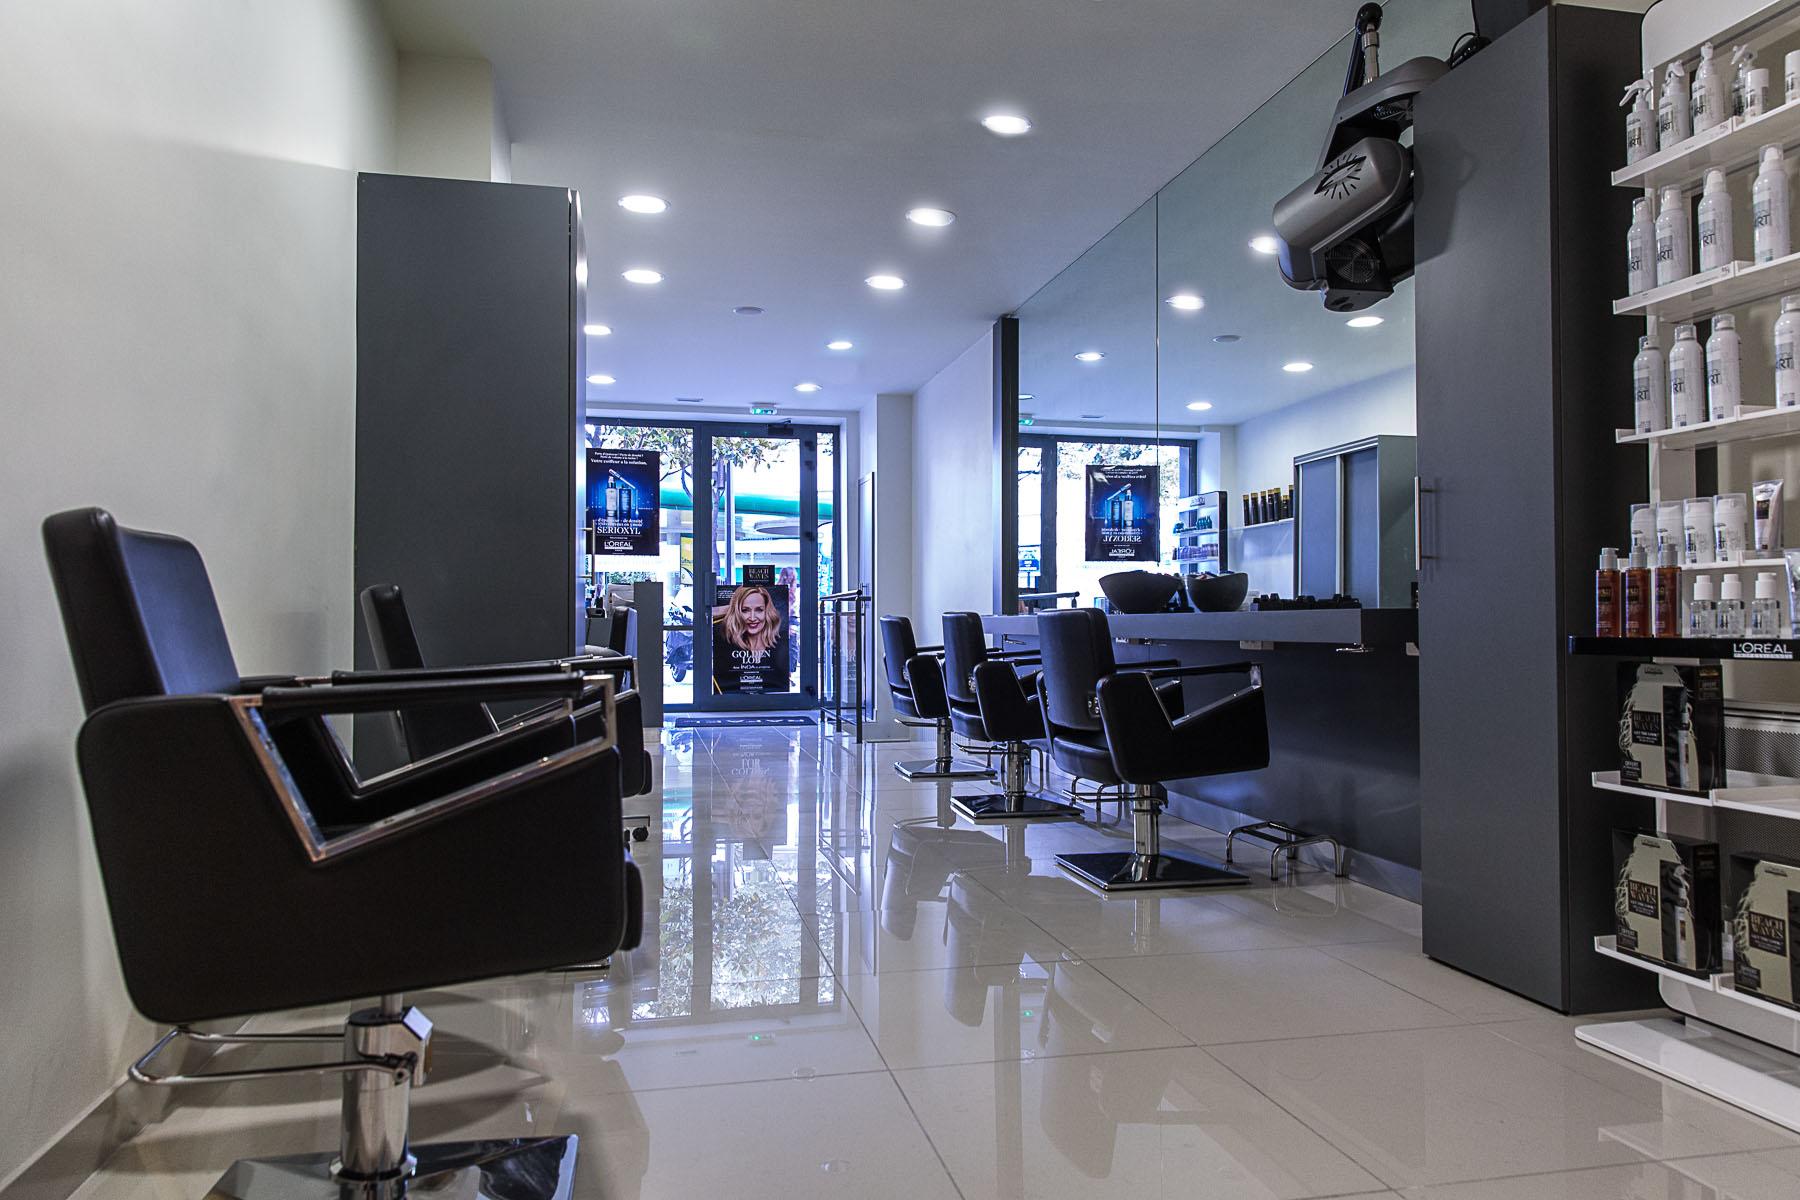 Yann renoard photographe salon de coiffure for Business plan salon de coiffure pdf